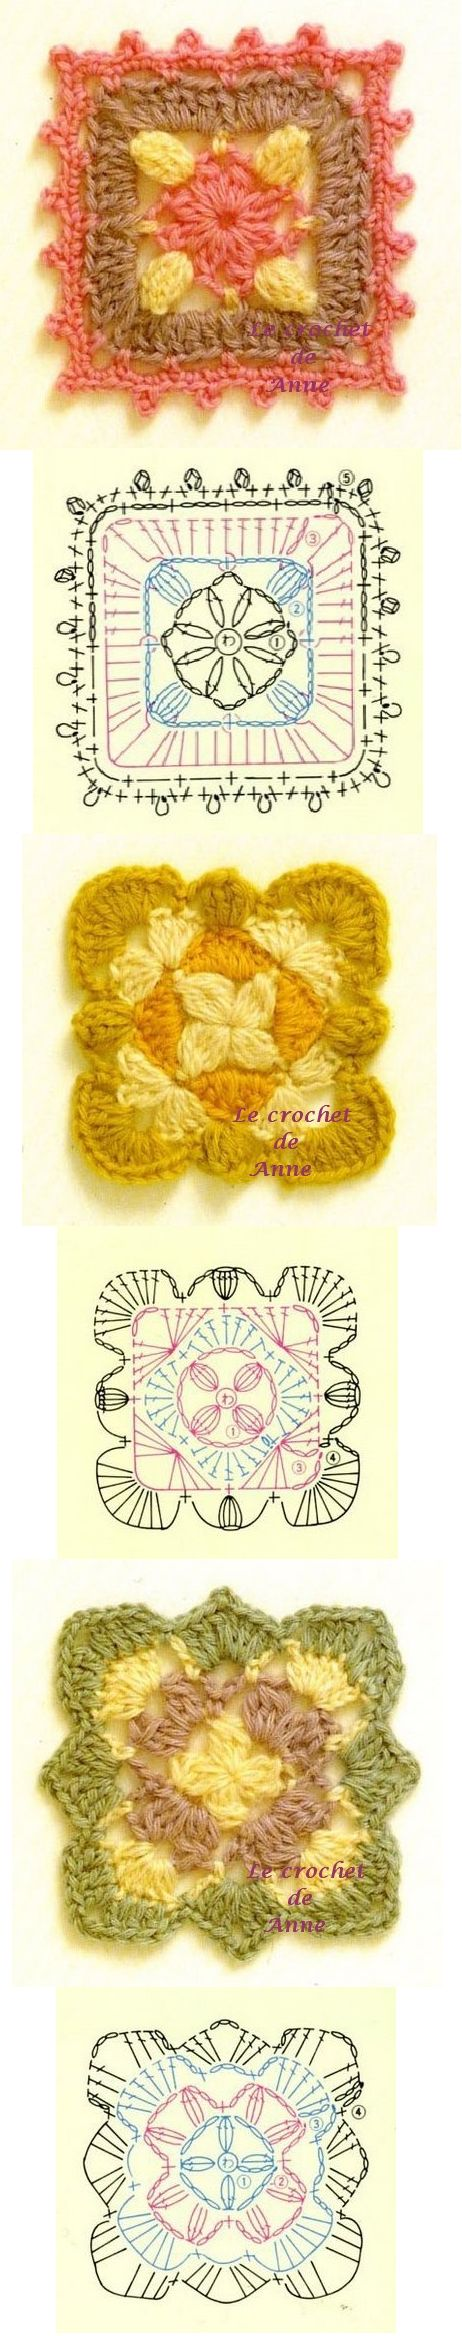 Simple yet pretty crochet grannies  Helpot isoäidin neliöt